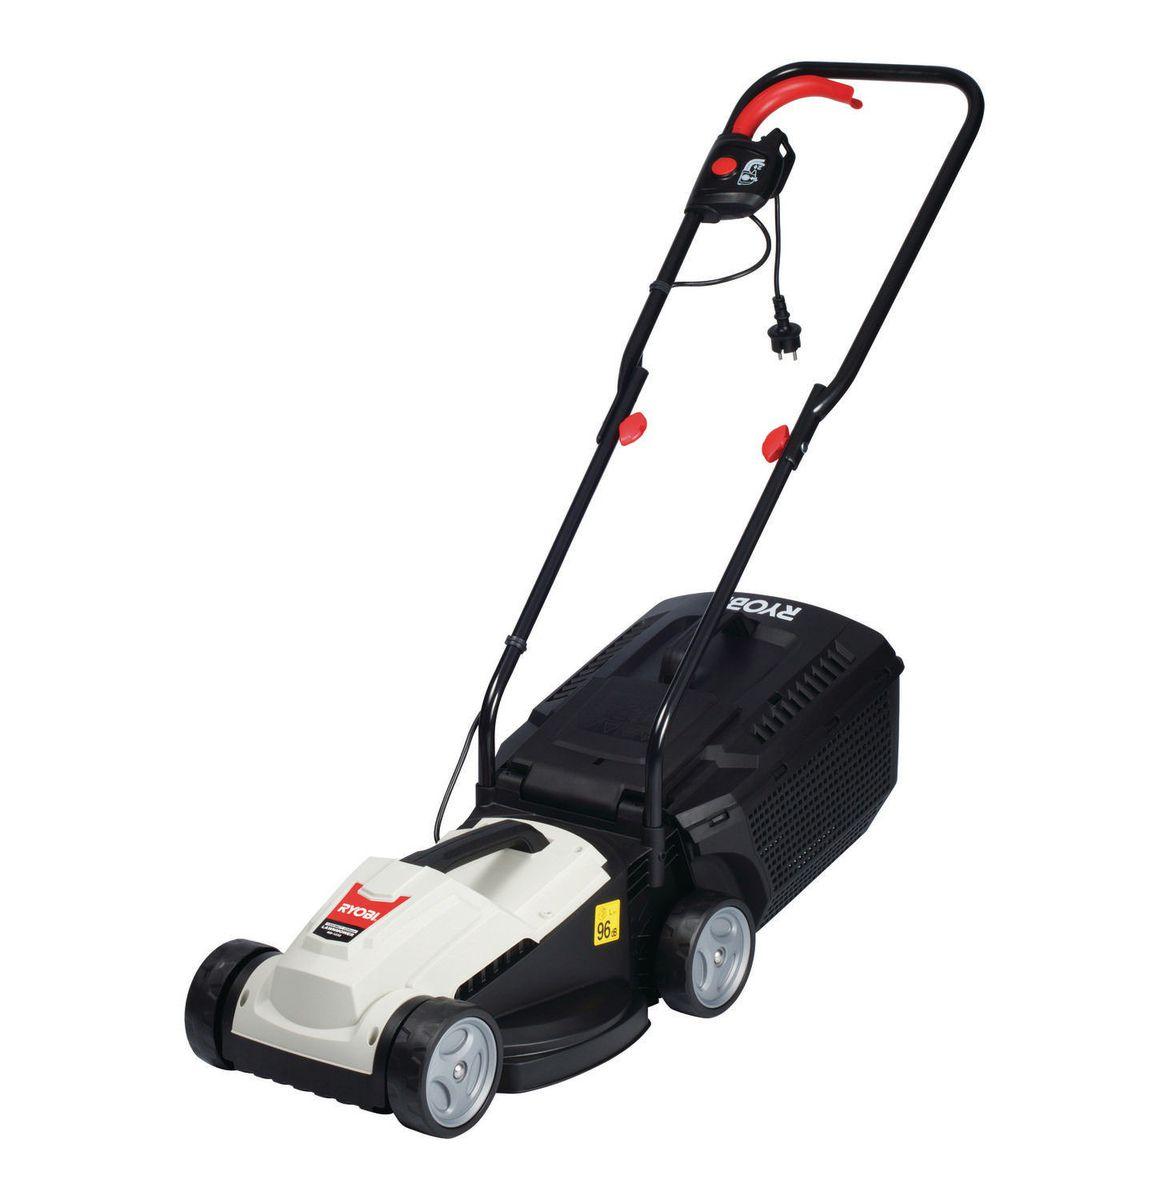 riding lawn mowers in canada apexi avcr wiring diagram subaru ryobi electrical 1200w lawnmower black buy online